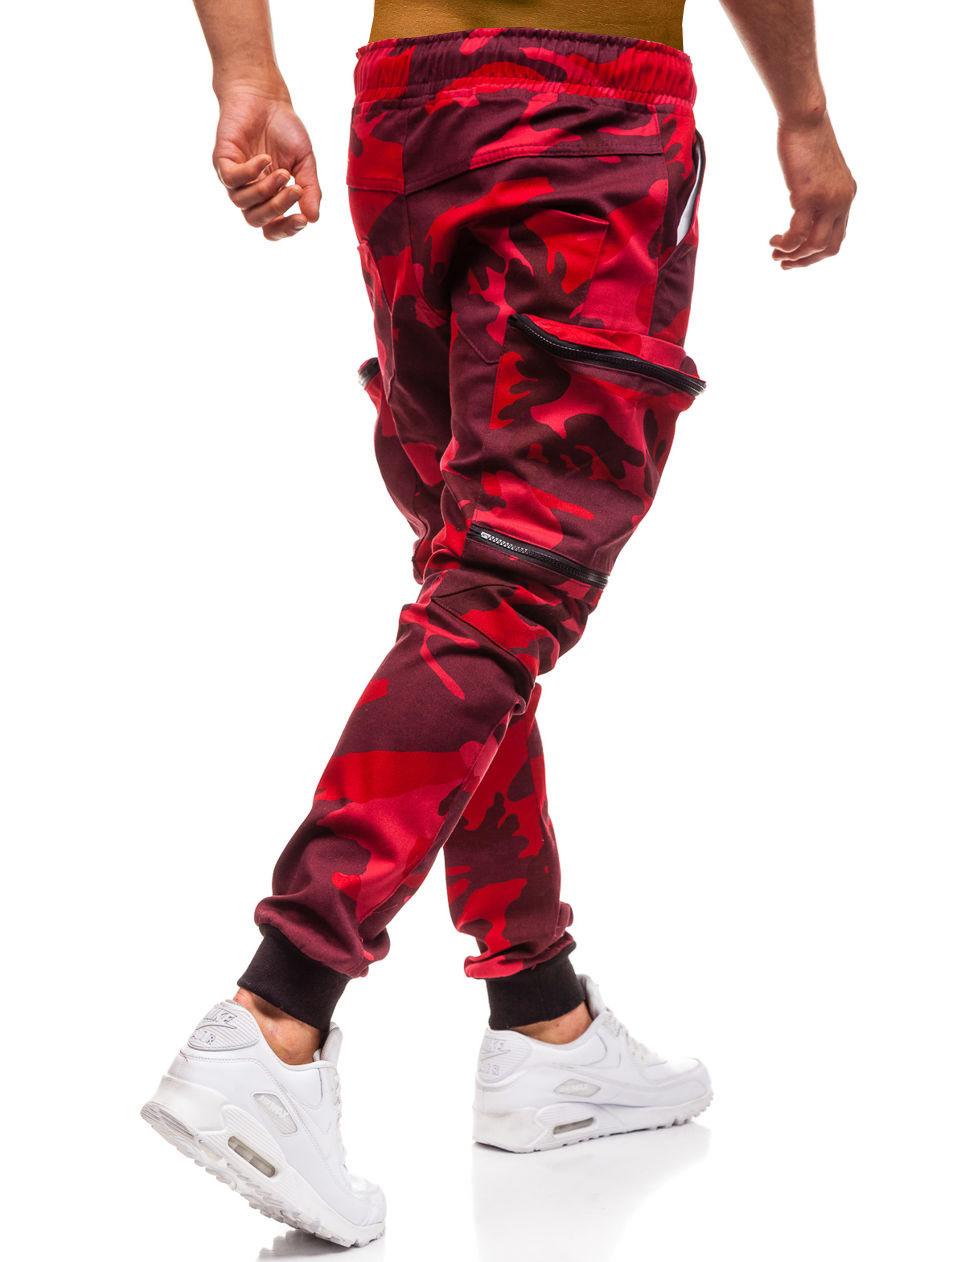 HTB1atHkLYrpK1RjSZTEq6AWAVXat Mens Joggers 2019 New Red Camouflage Multi-Pockets Cargo Pants Men Cotton Harem Pants Hip Hop Trousers Streetwear XXXL